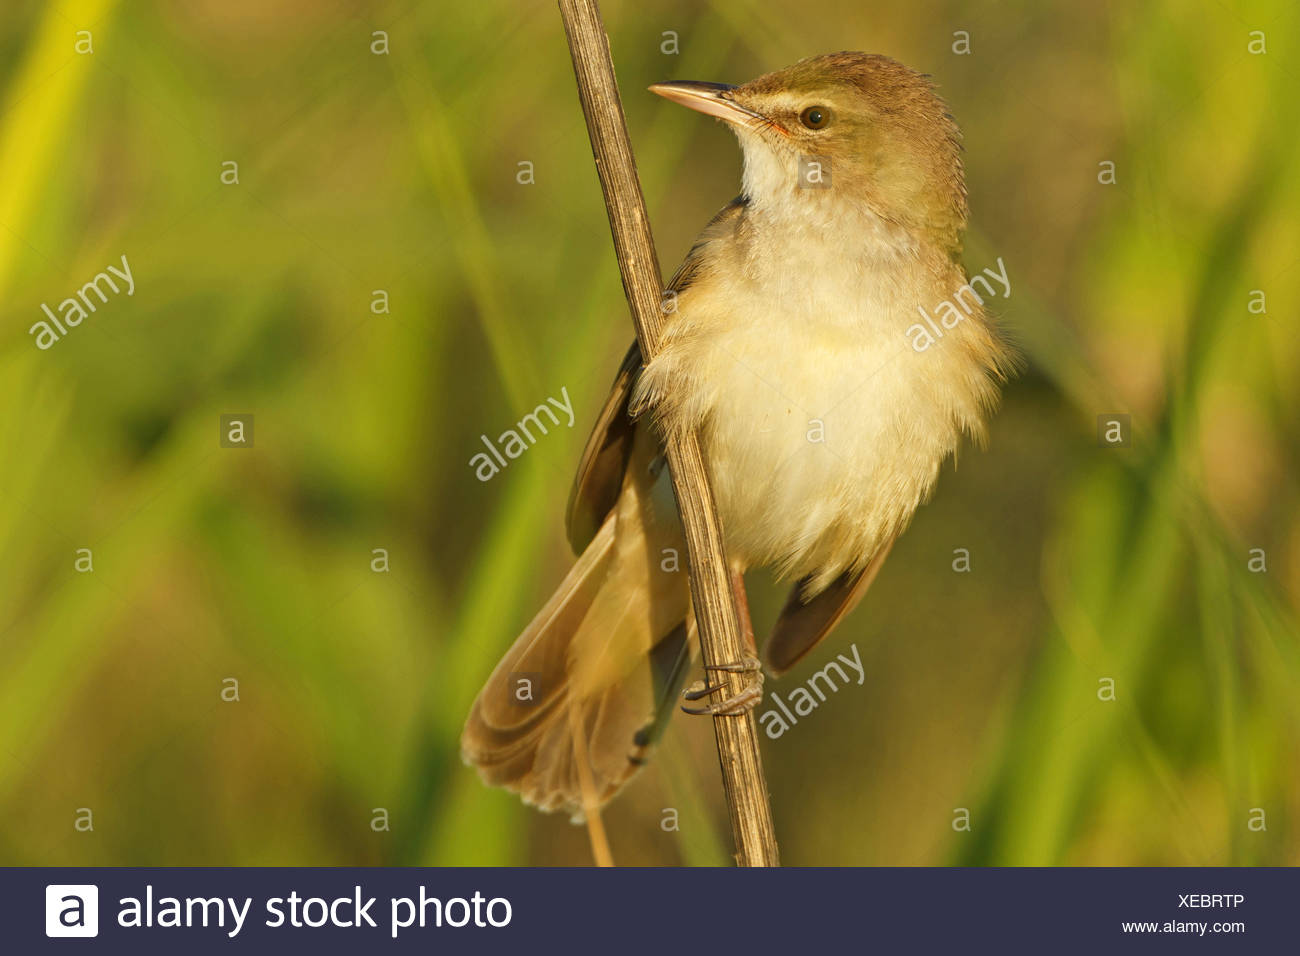 great reed warbler (Acrocephalus arundinaceus), sitting at a sprout, Turkey, Sanliurfa, Birecik Gravel Pits Stock Photo